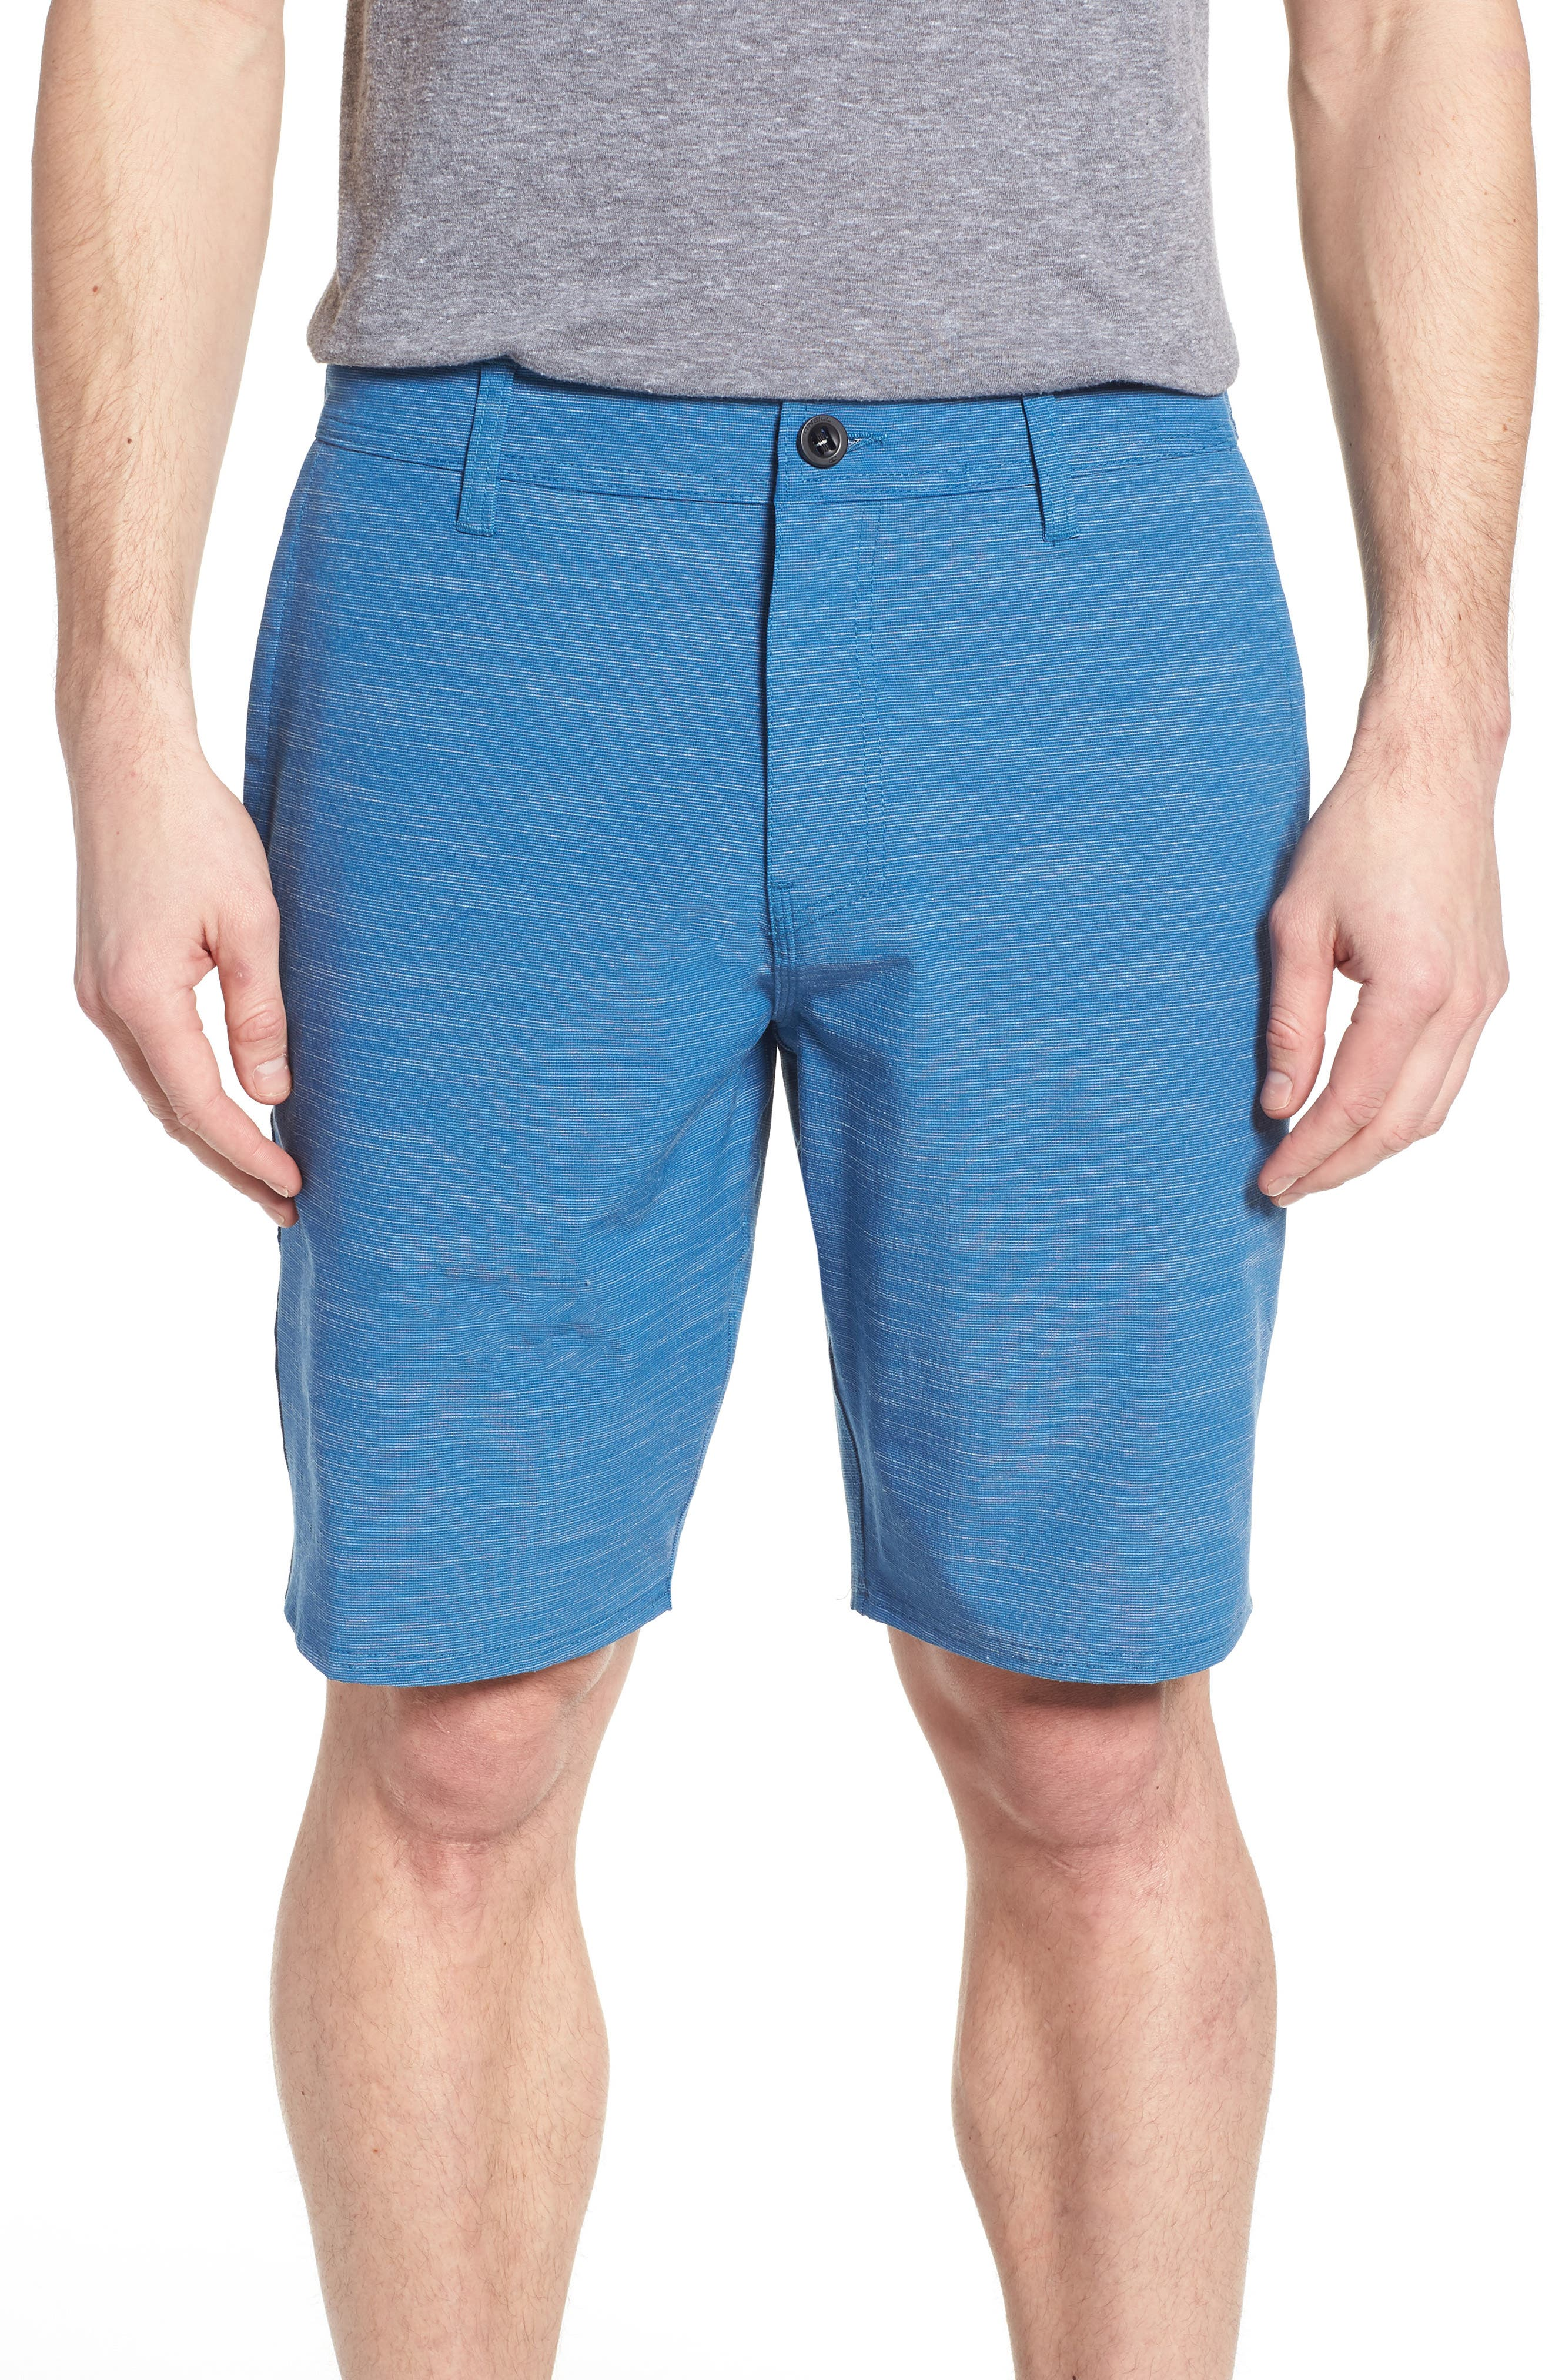 Locked Slub Hybrid Shorts,                         Main,                         color, Air Force Blue